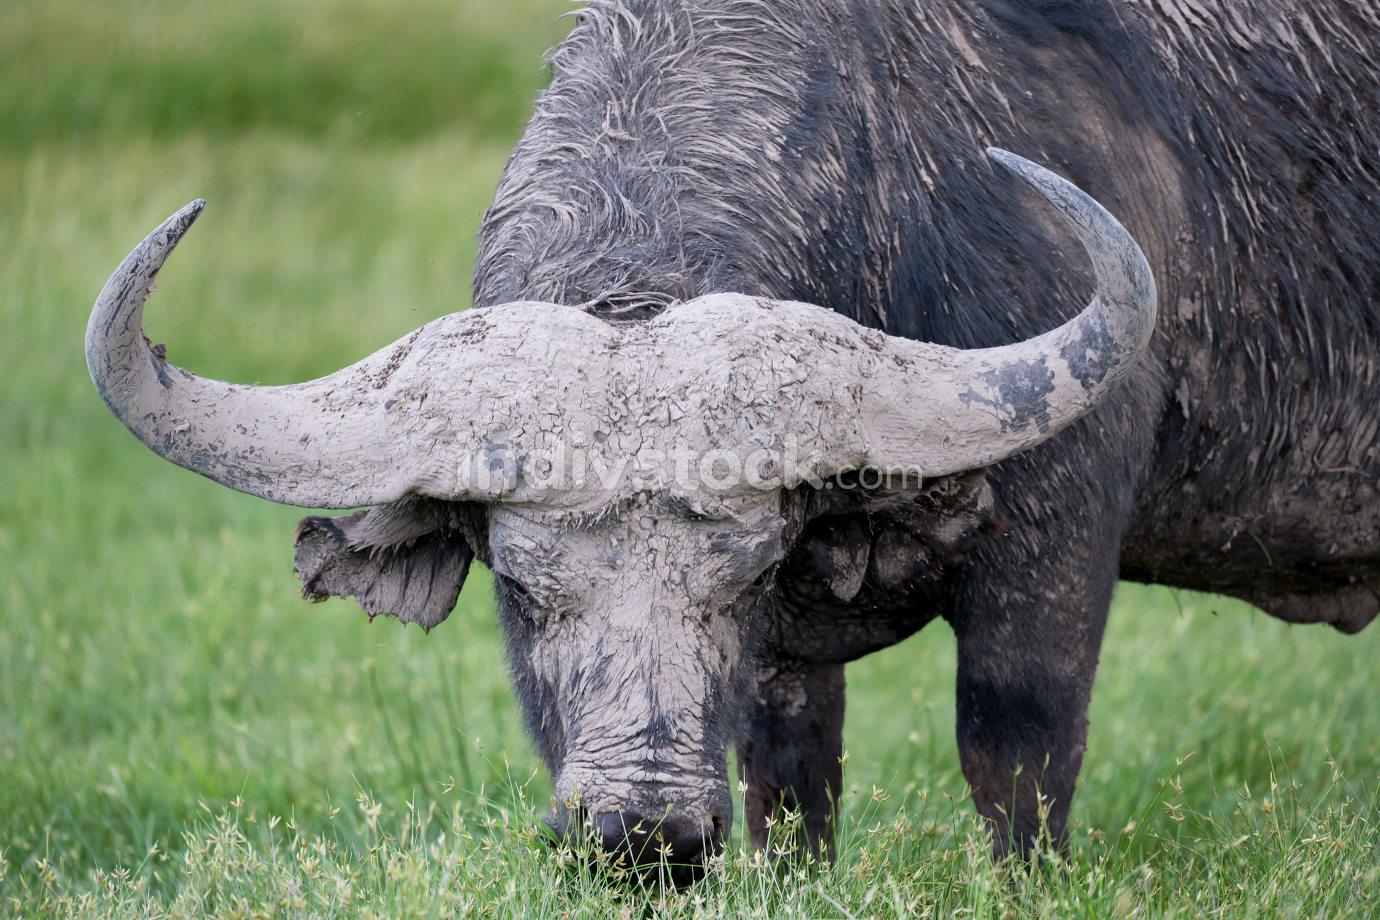 One big buffalo in the grassland of the savannah